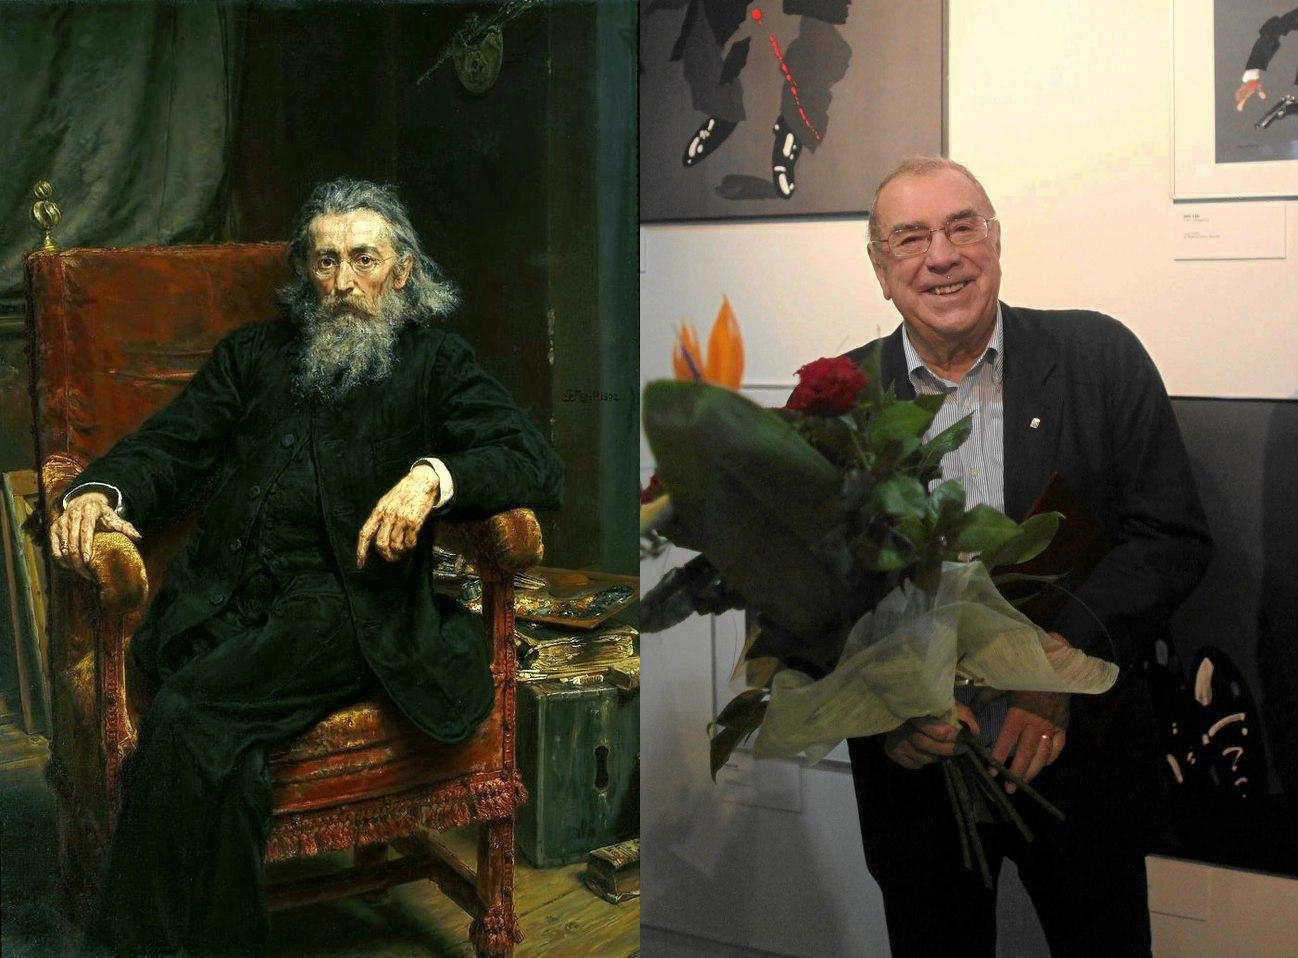 Jan Matejko (Wikipedia.org / http://bit.ly/1F83aCD / CC BY / http://bit.ly/1KVnLPx) oraz Waldemar Świerzy (fot. Dawid Chalimoniuk / Agencja Gazeta)